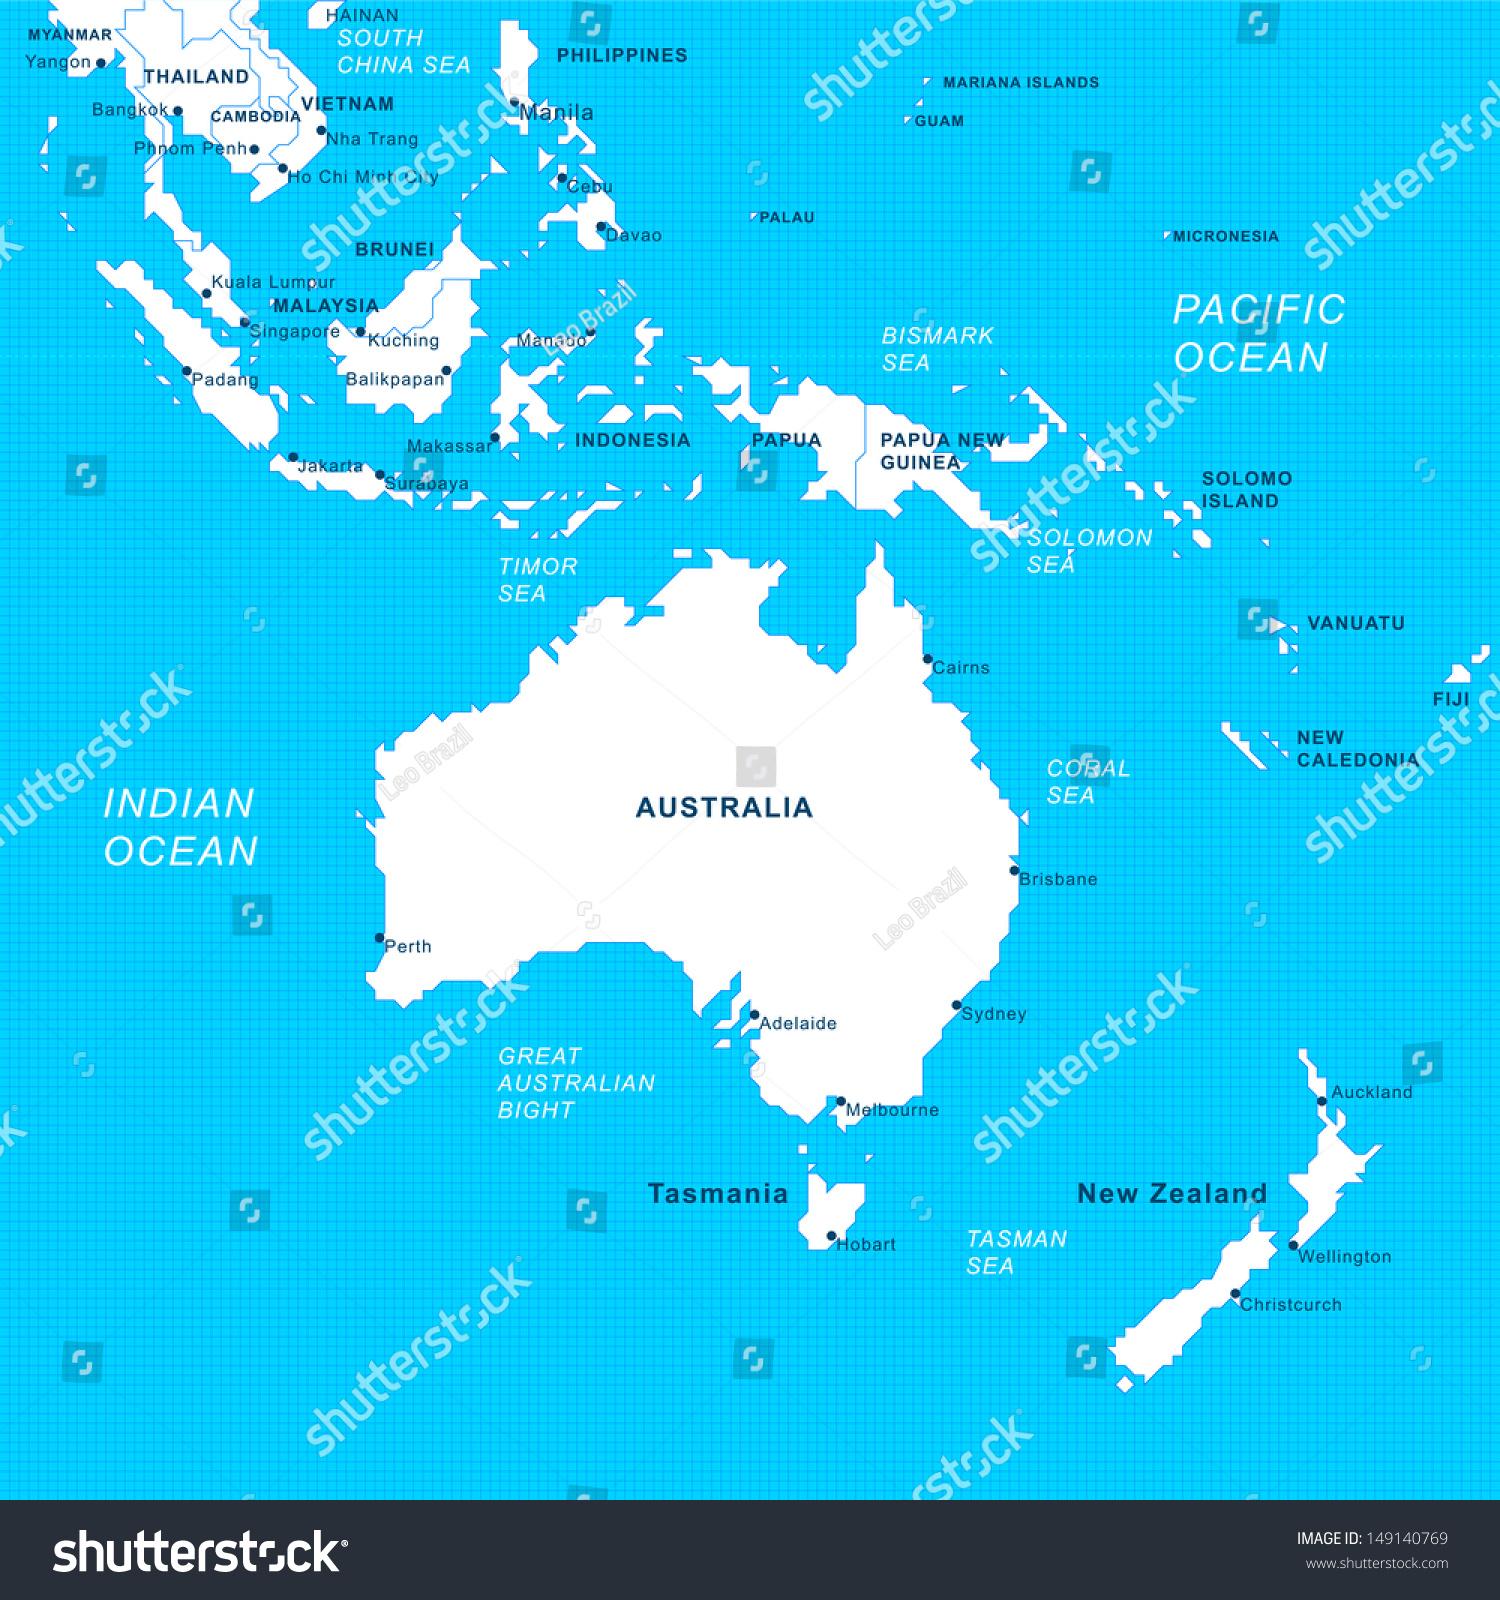 Australia South Pacific: South Asia / Australia Pacific Region